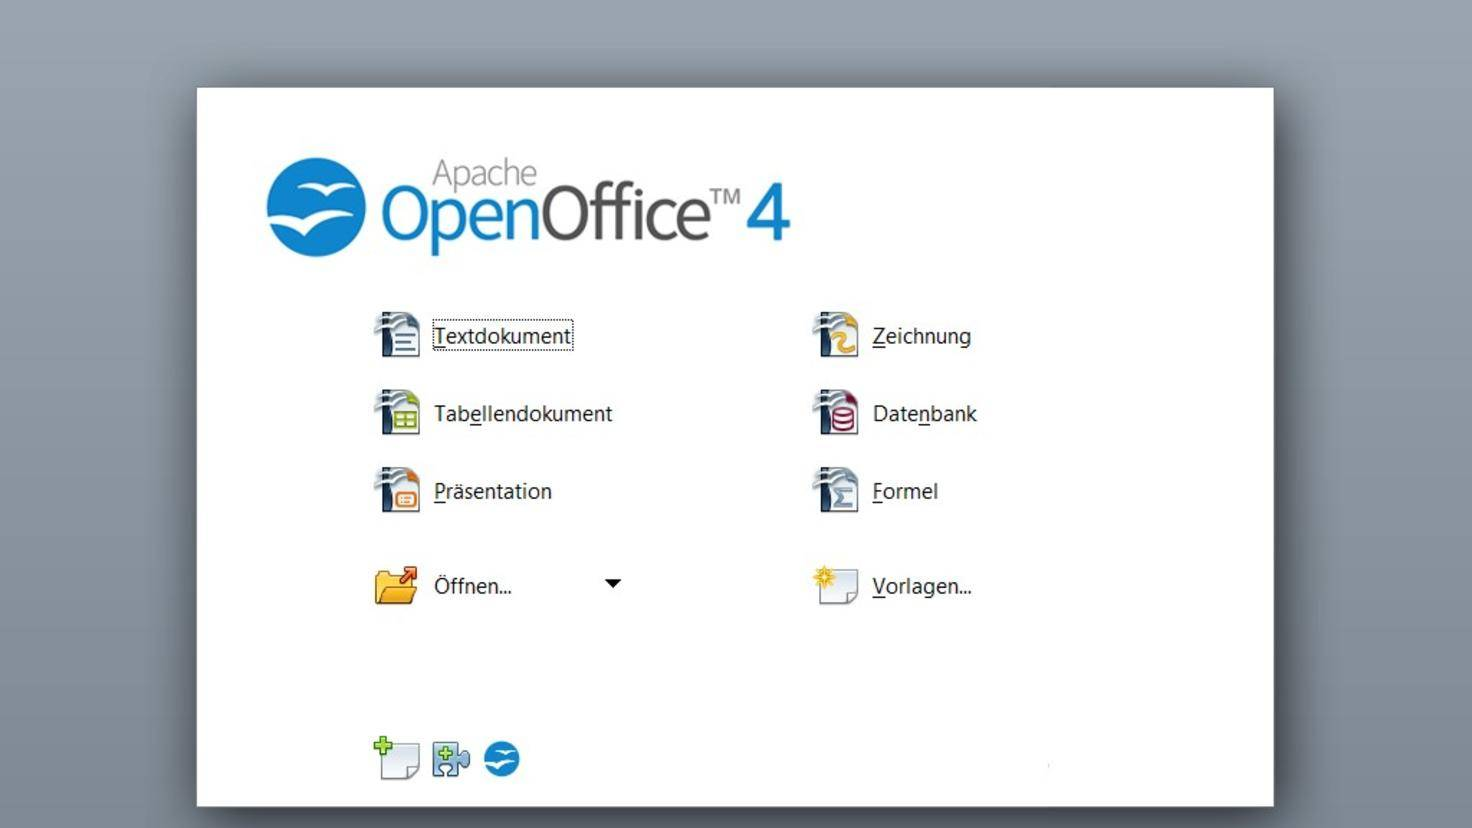 Apache Open Office 4